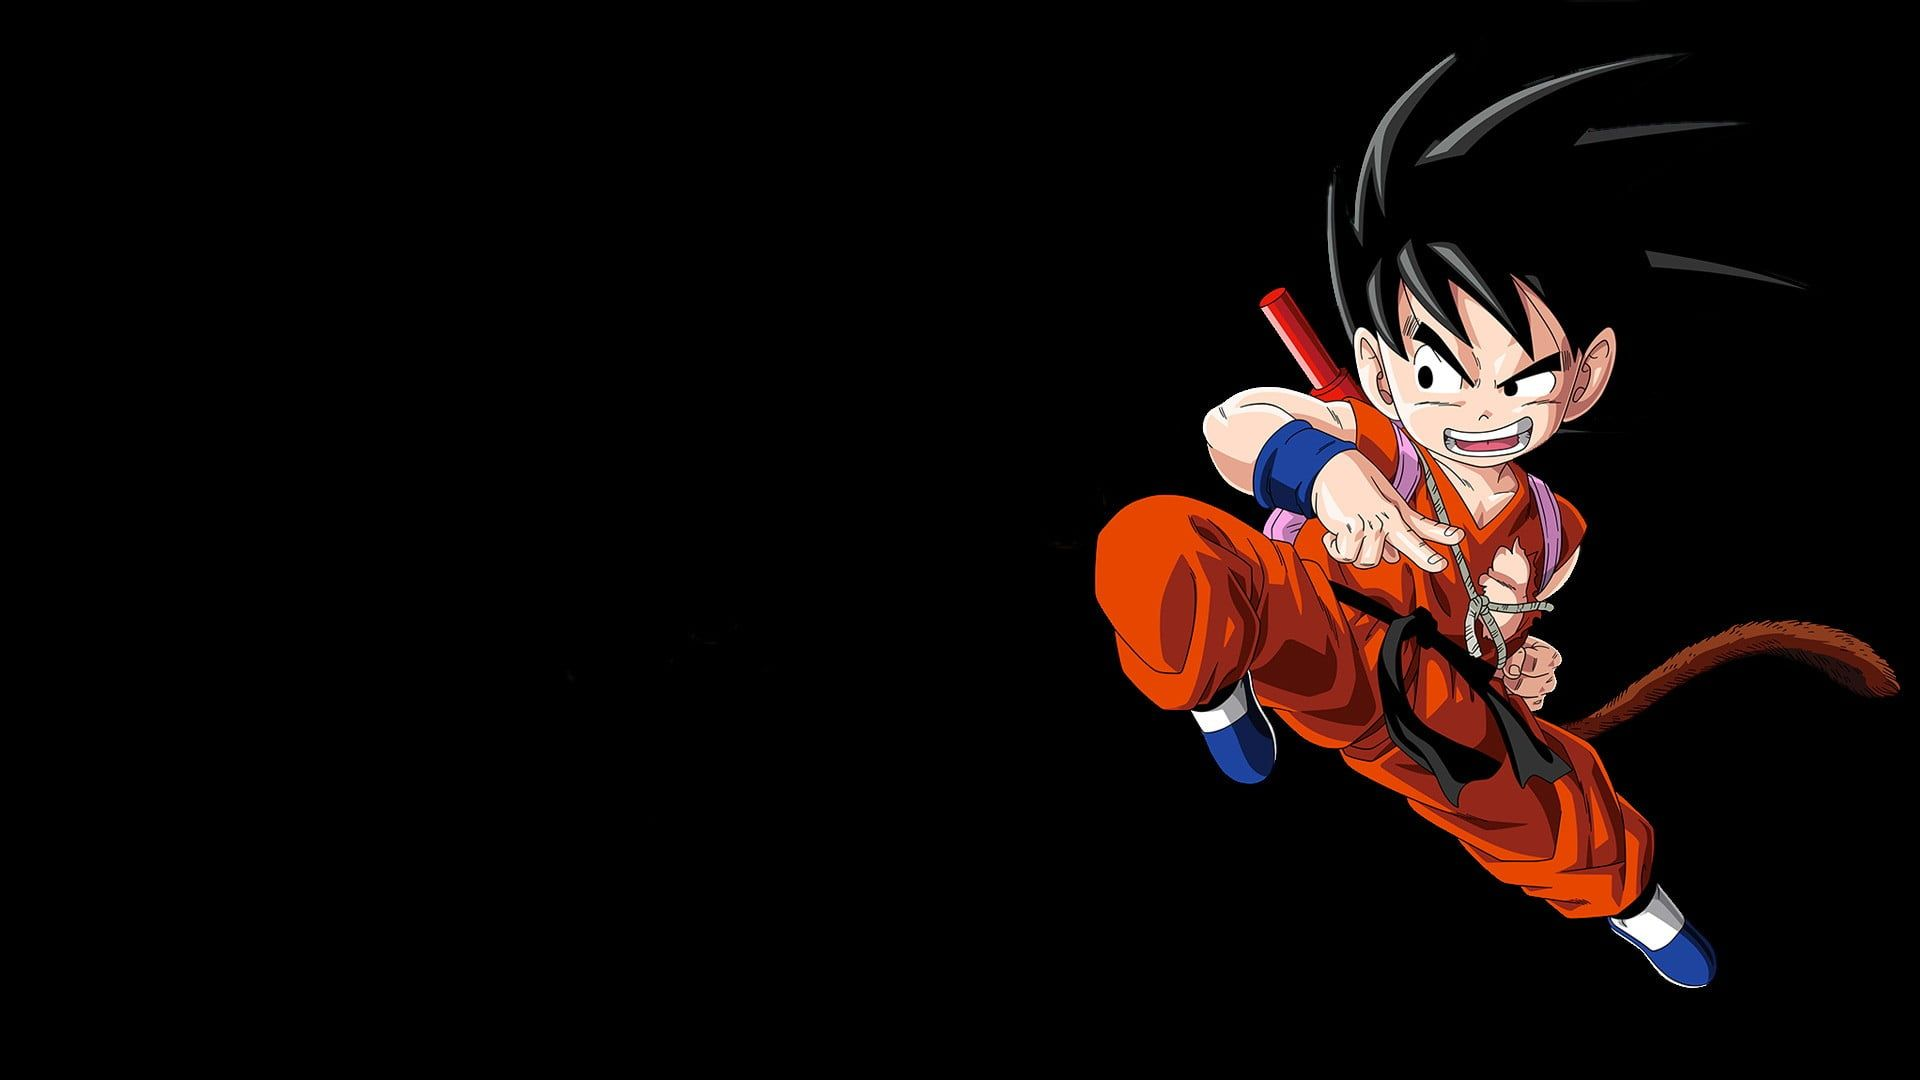 Son Goku Dragon Ball Z Kid Goku Anime Anime Boys 1080p Wallpaper Hdwallpaper Desktop In 2021 Dragon Ball Wallpapers Goku Wallpaper Z Wallpaper